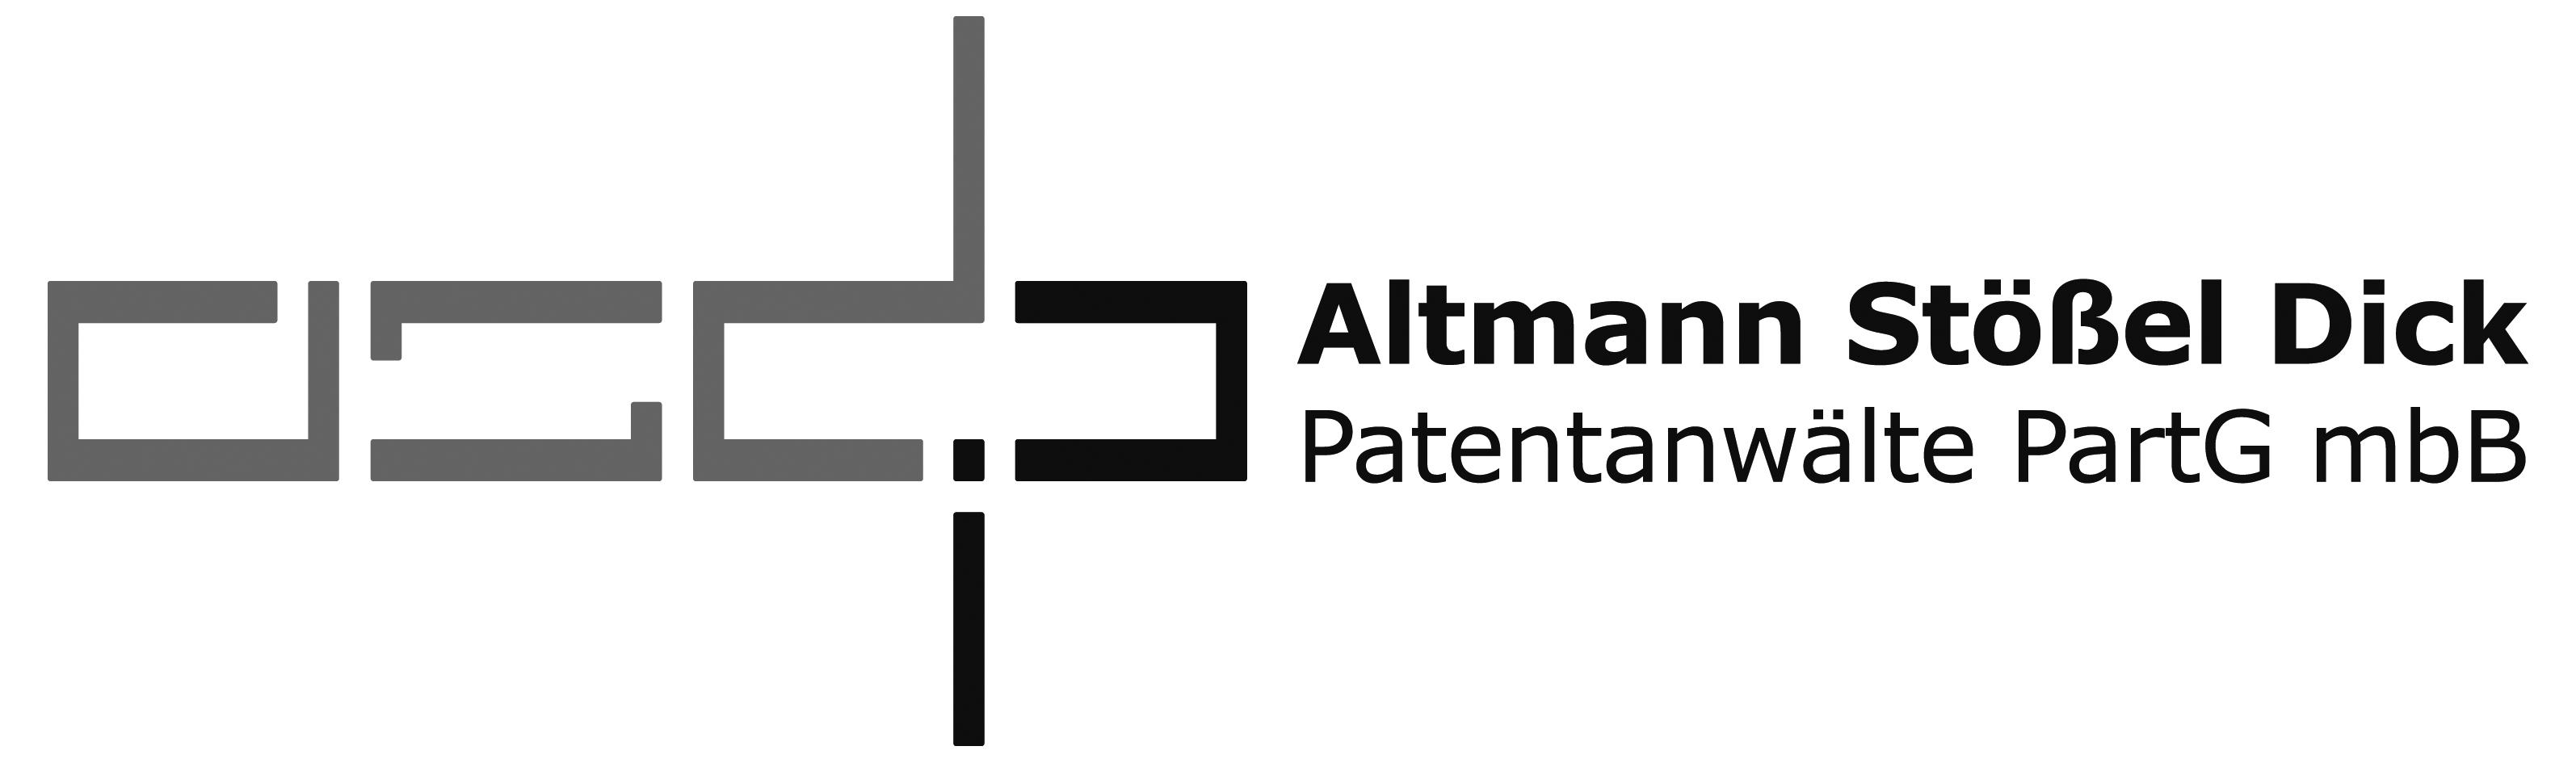 Altmann Stößel Dick Patentanwälte PartG mbB